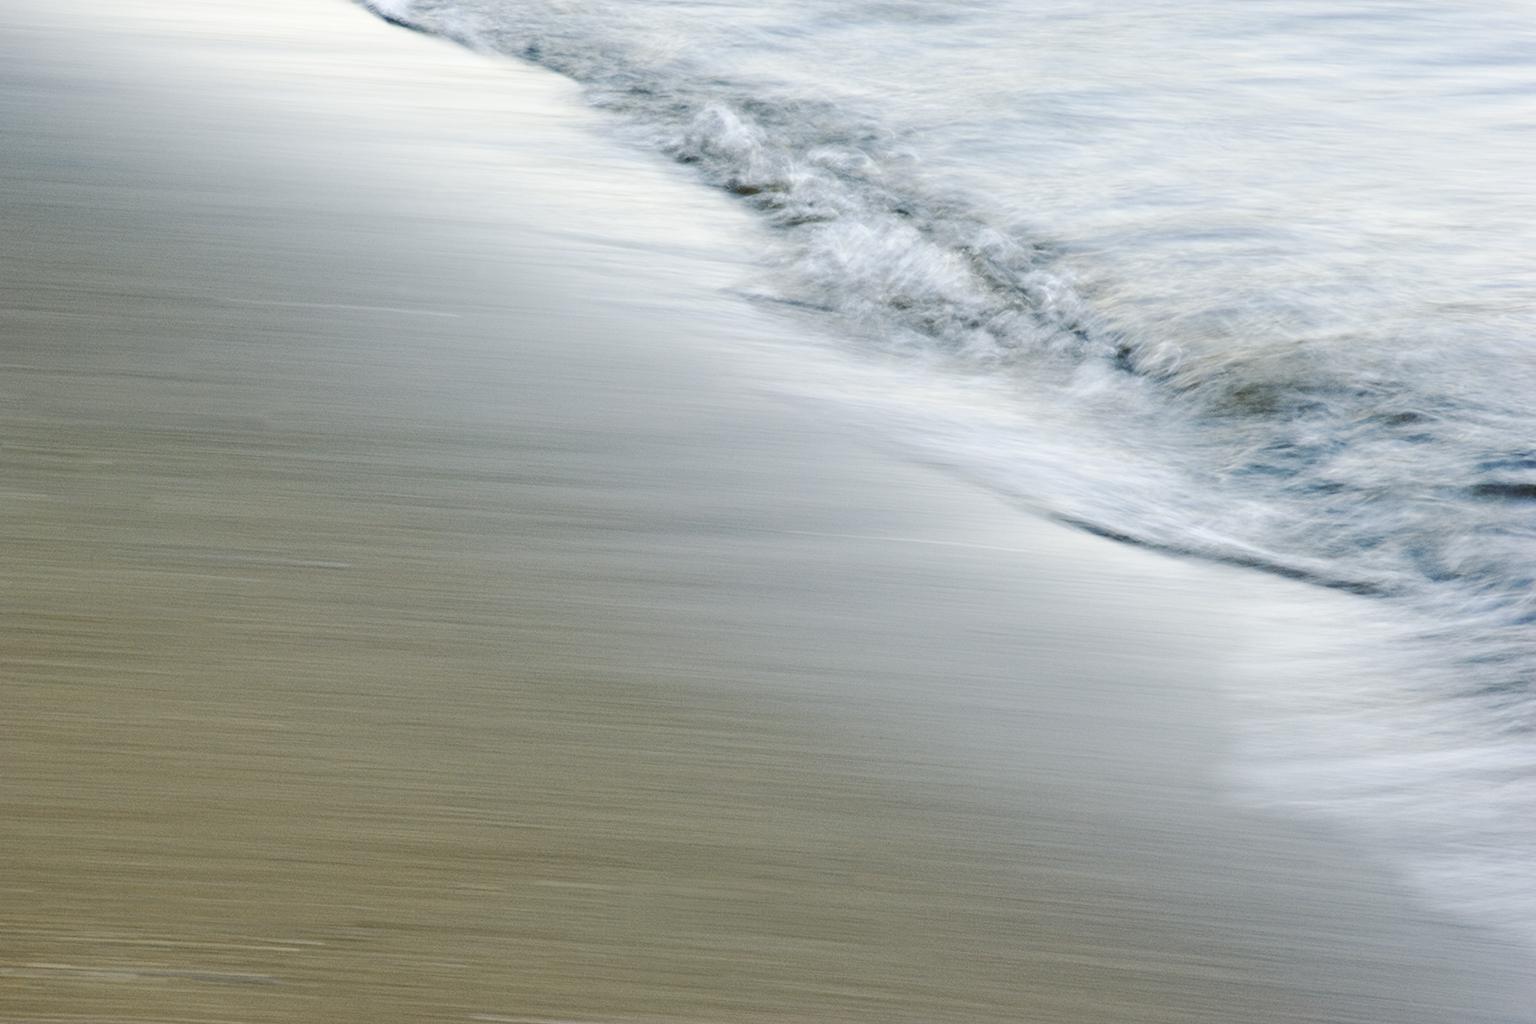 SURREAL BLUE SEA